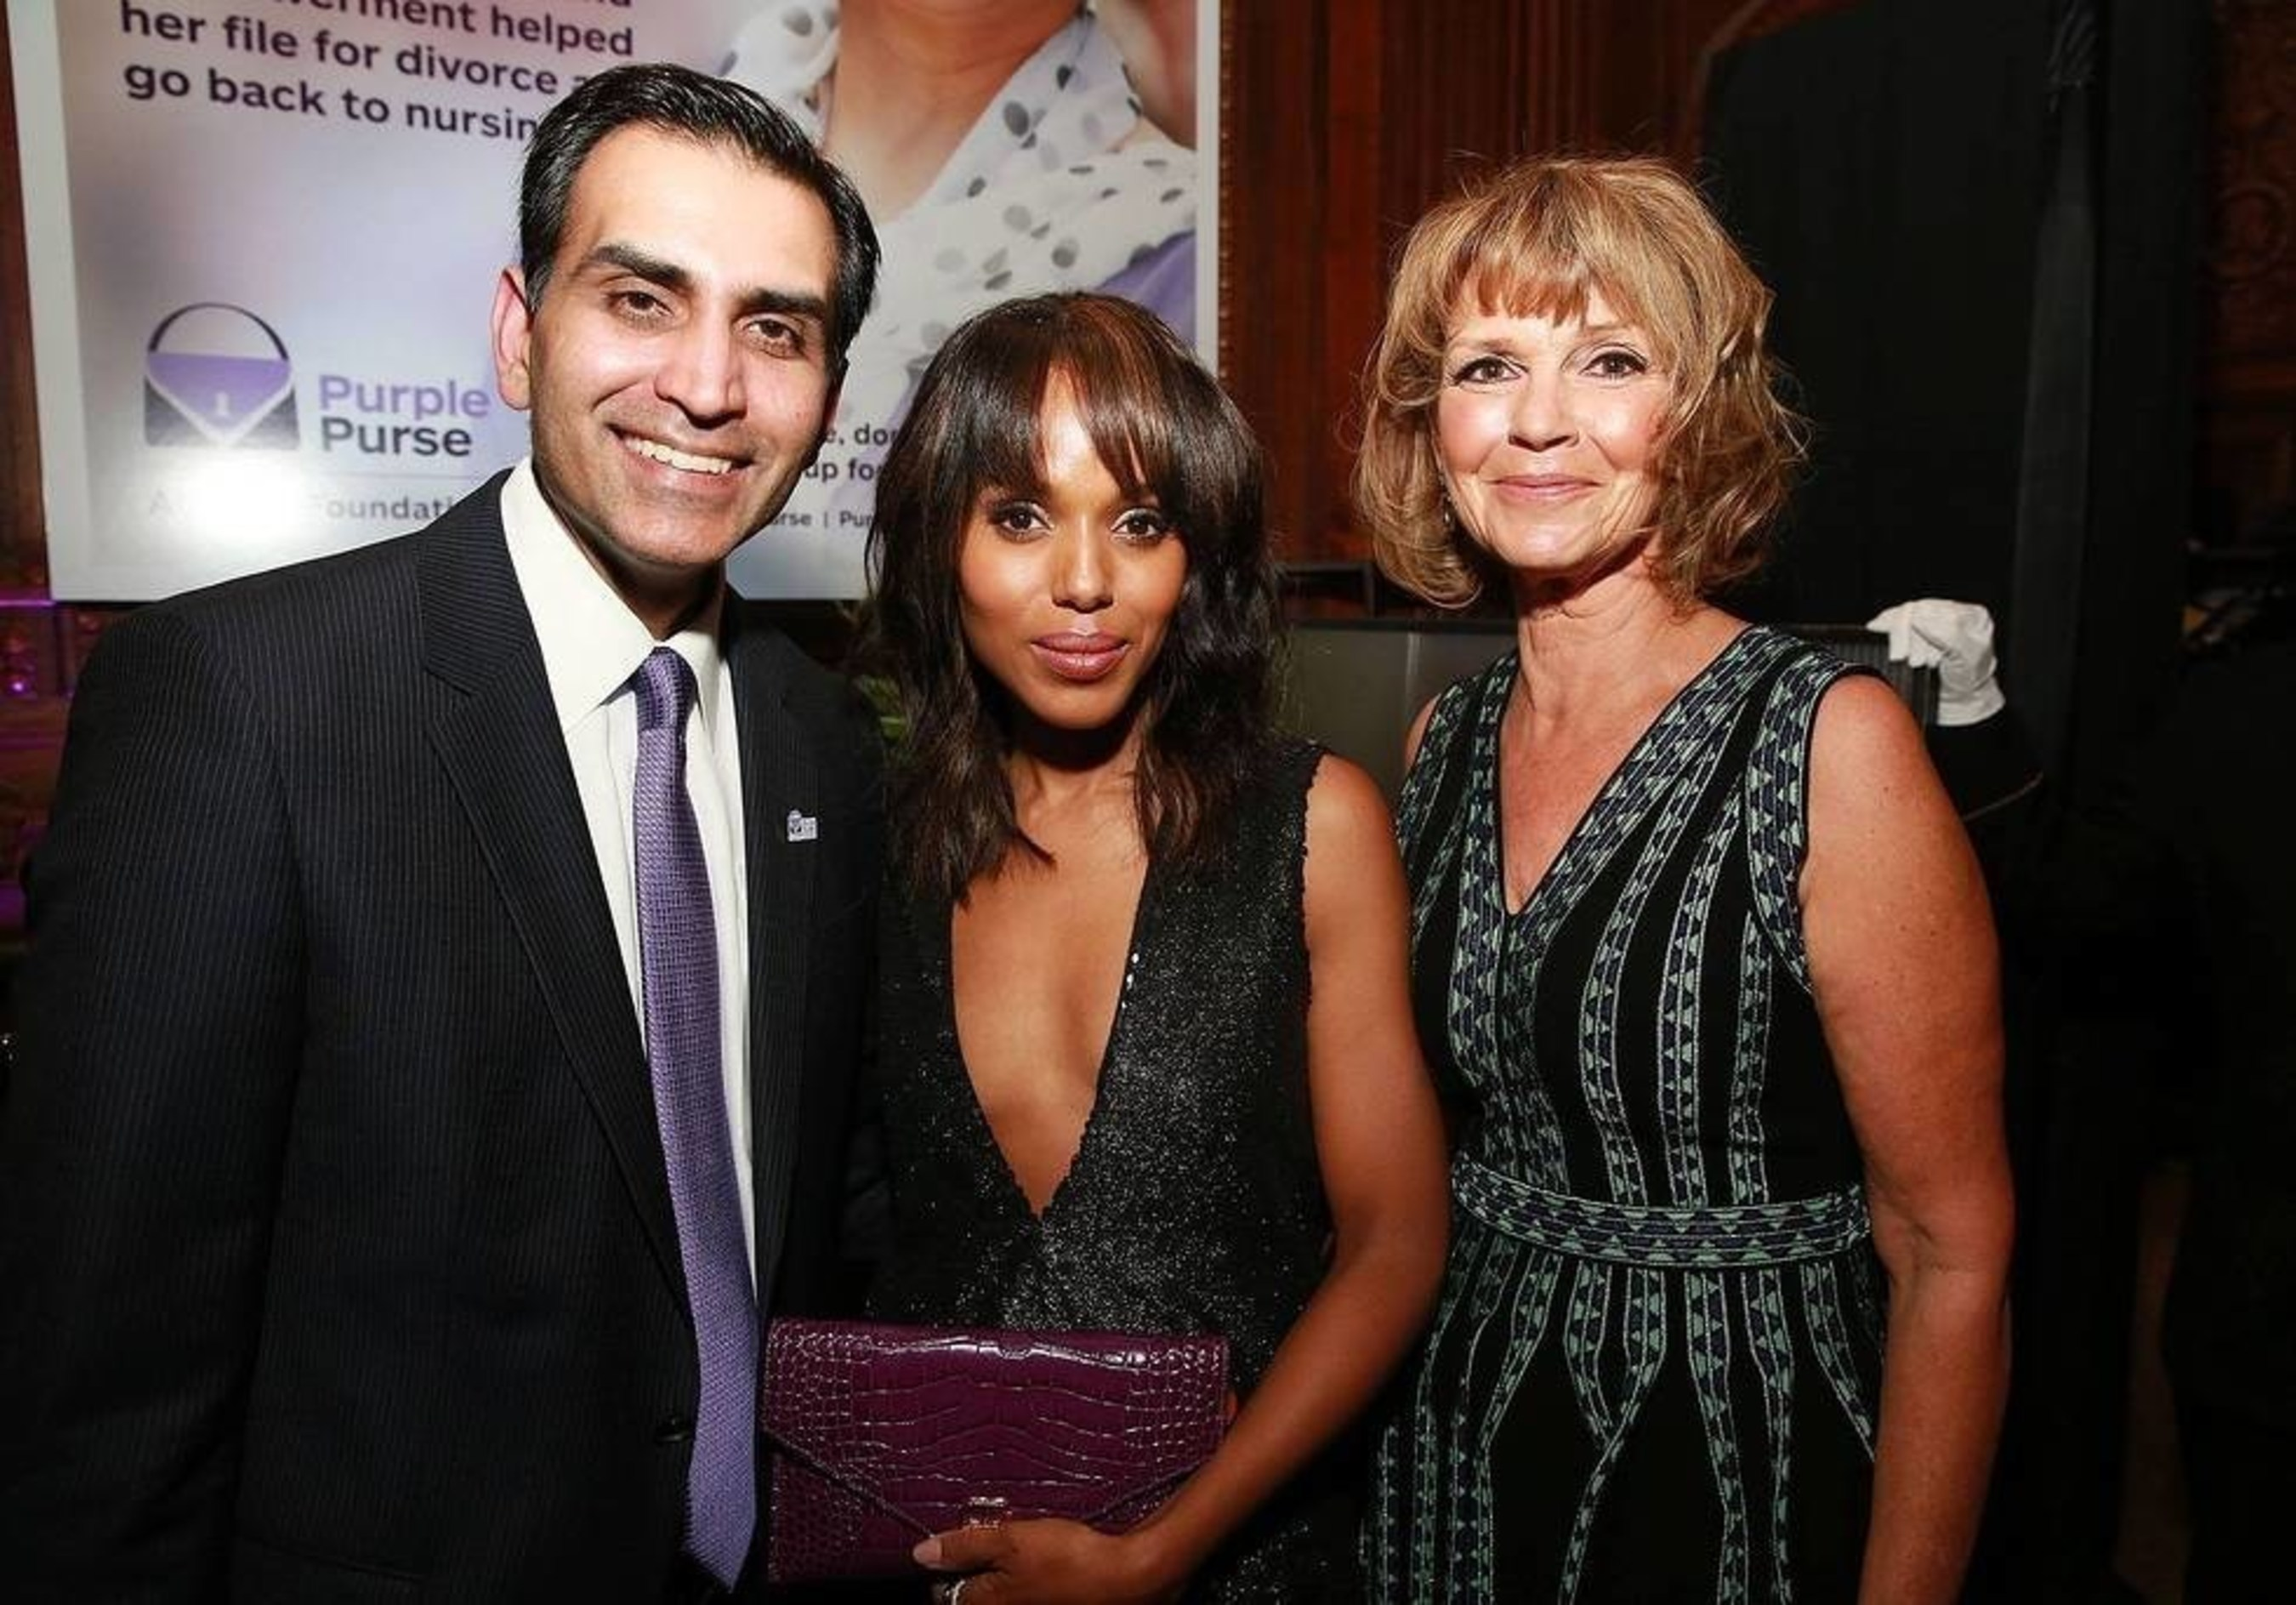 Sanjay Gupta (Allstate EVP), Vicky Dinges (Allstate Foundation SVP, CSR) and Kerry Washington